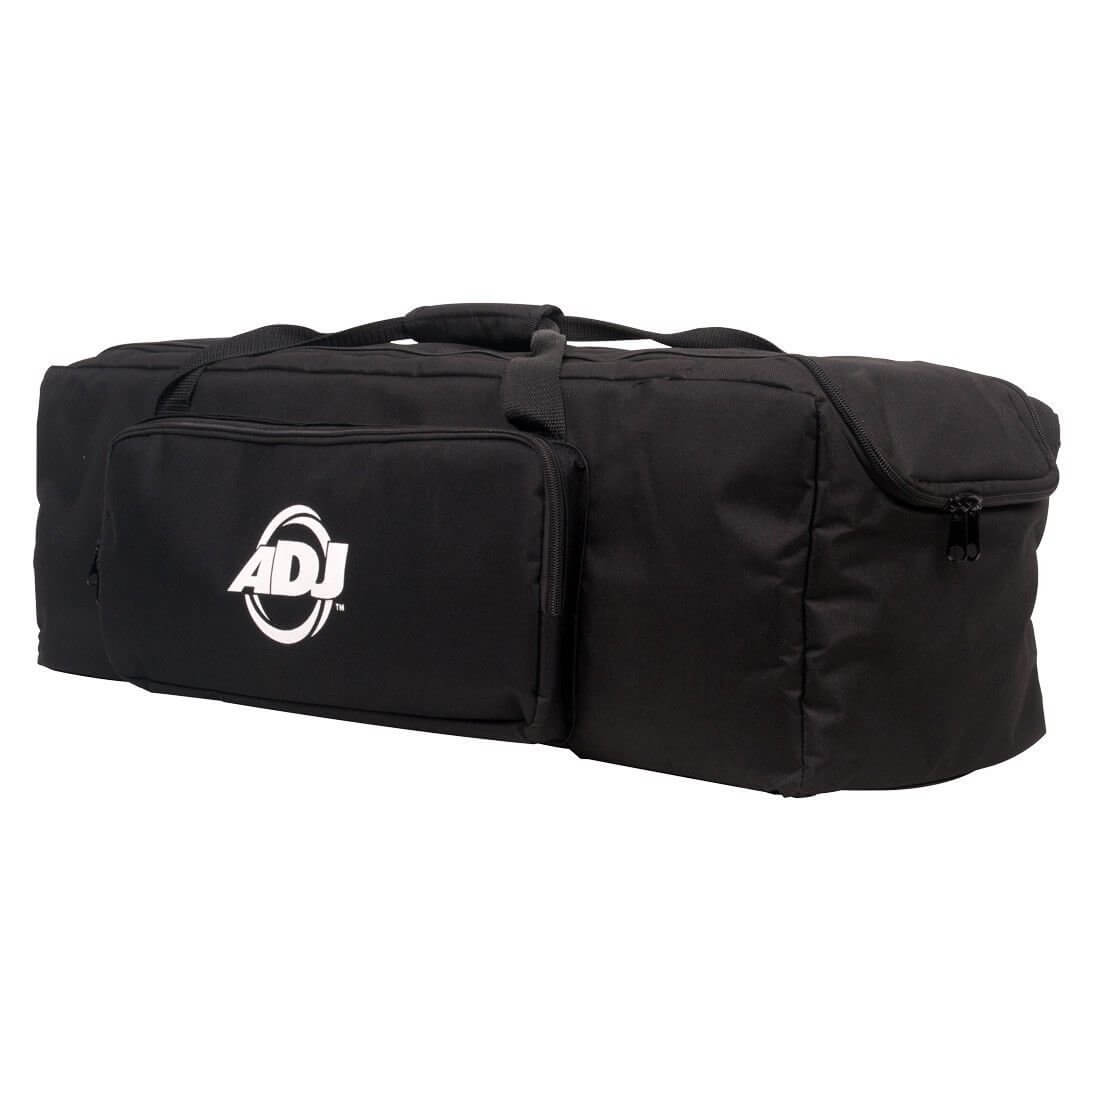 ADJ Flat Bag 8 Soft Padded Case for Slim Par Can LED Lighting flight case